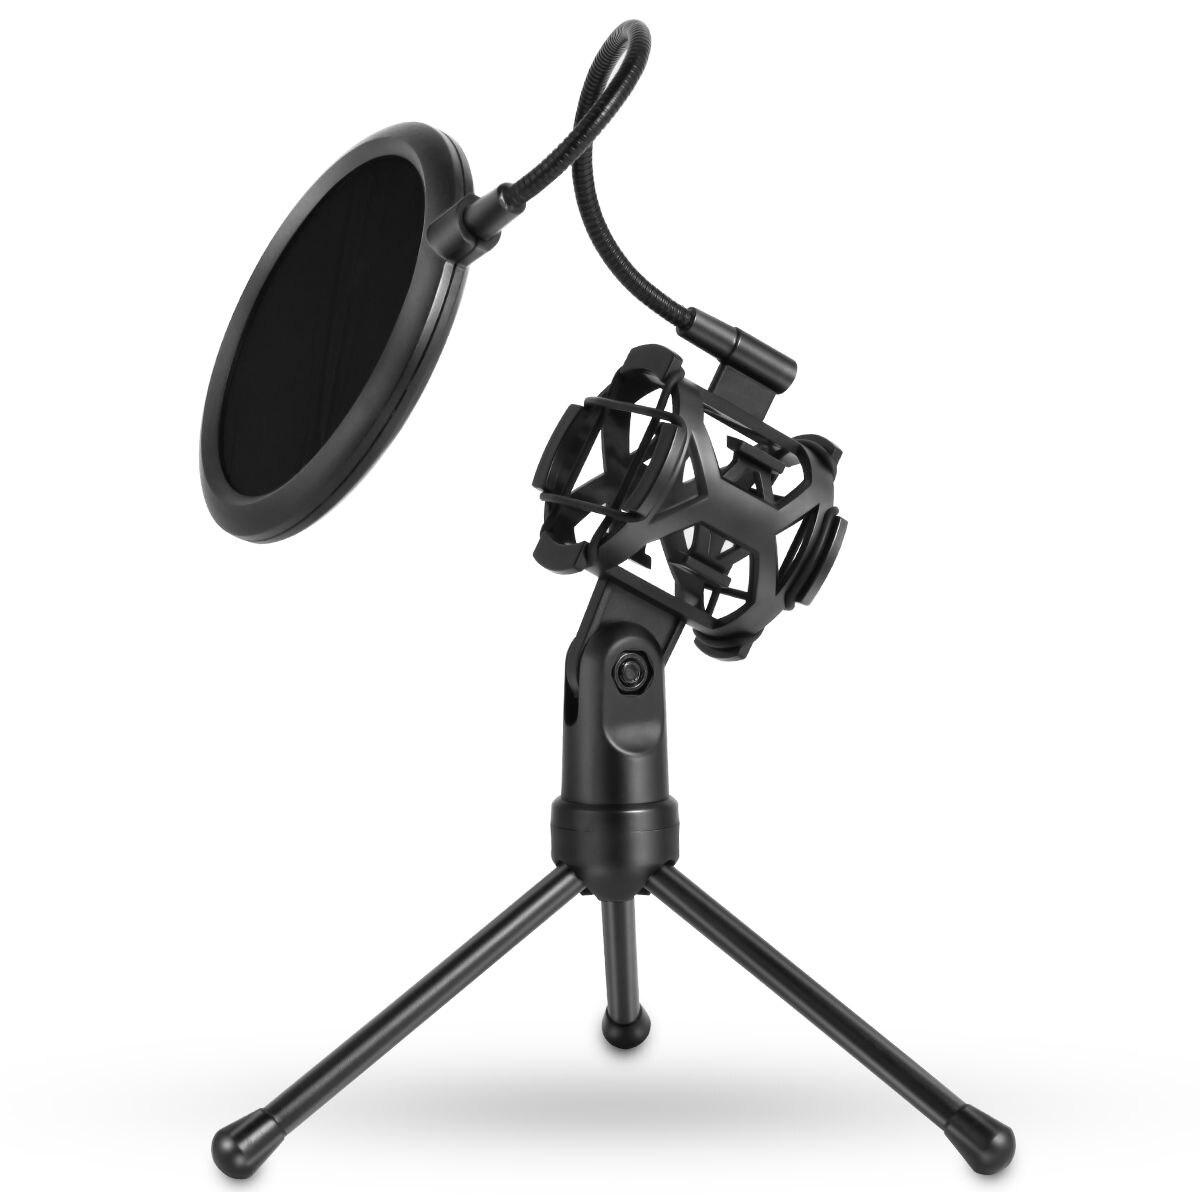 Portable Microphone Stand Desktop Tripod Recording Microphone Stand With Microphone Clip Windscreen Filter